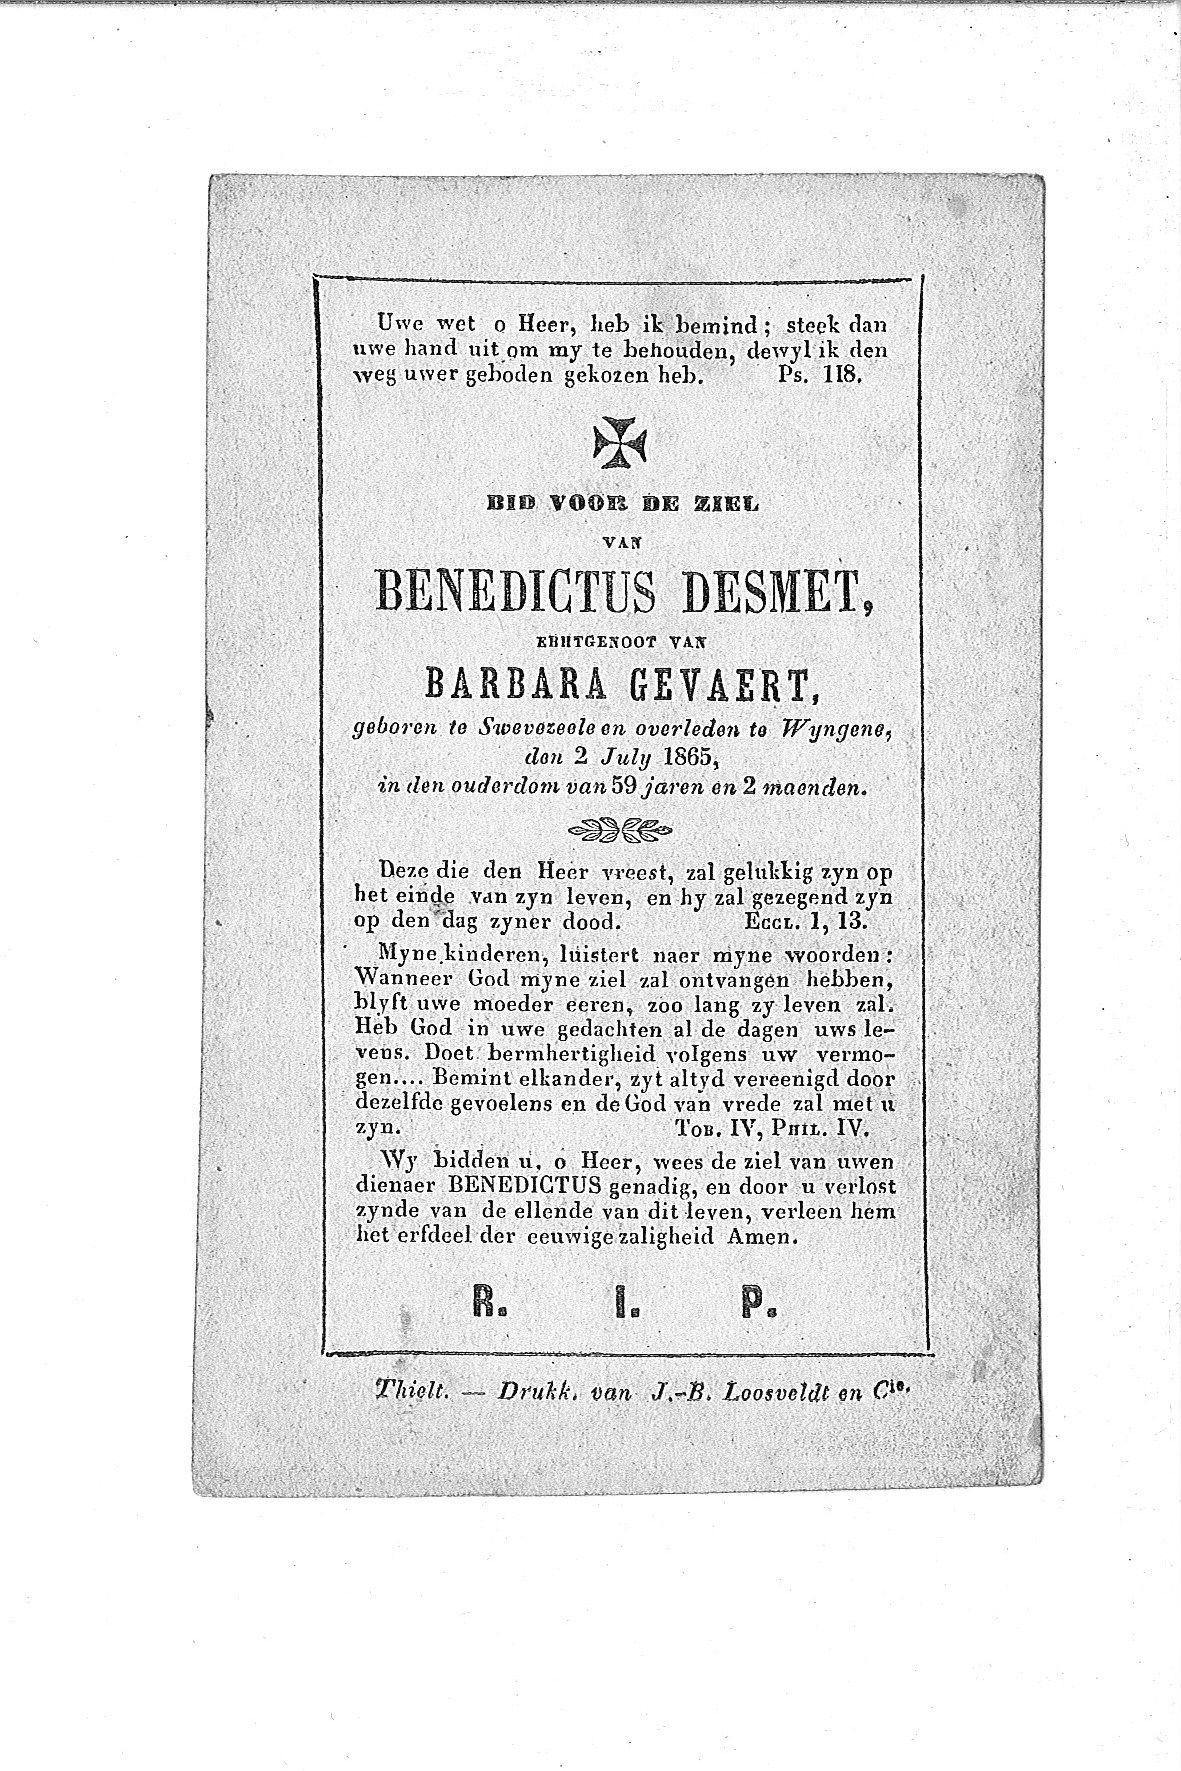 Benedictus (1865) 20091016092130_00003.jpg